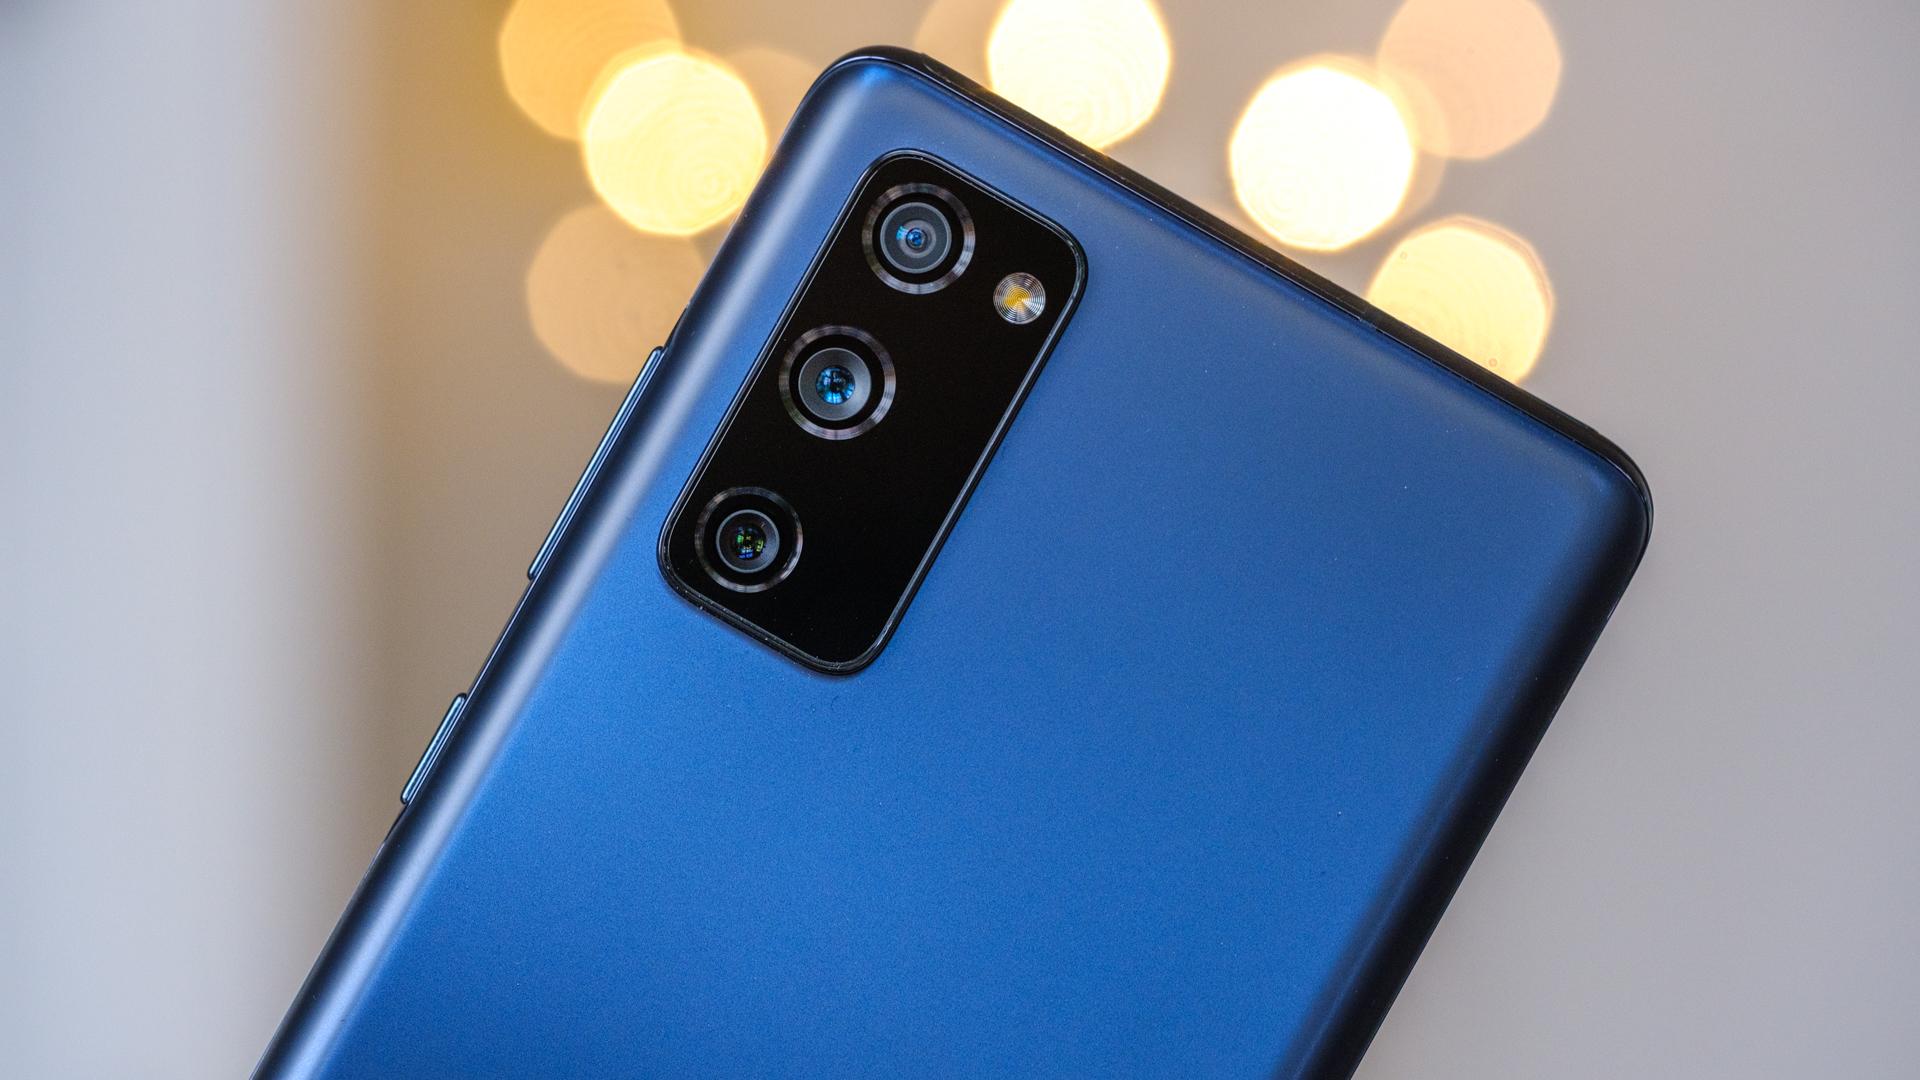 Samsung Galaxy S20 FE camera macro off center